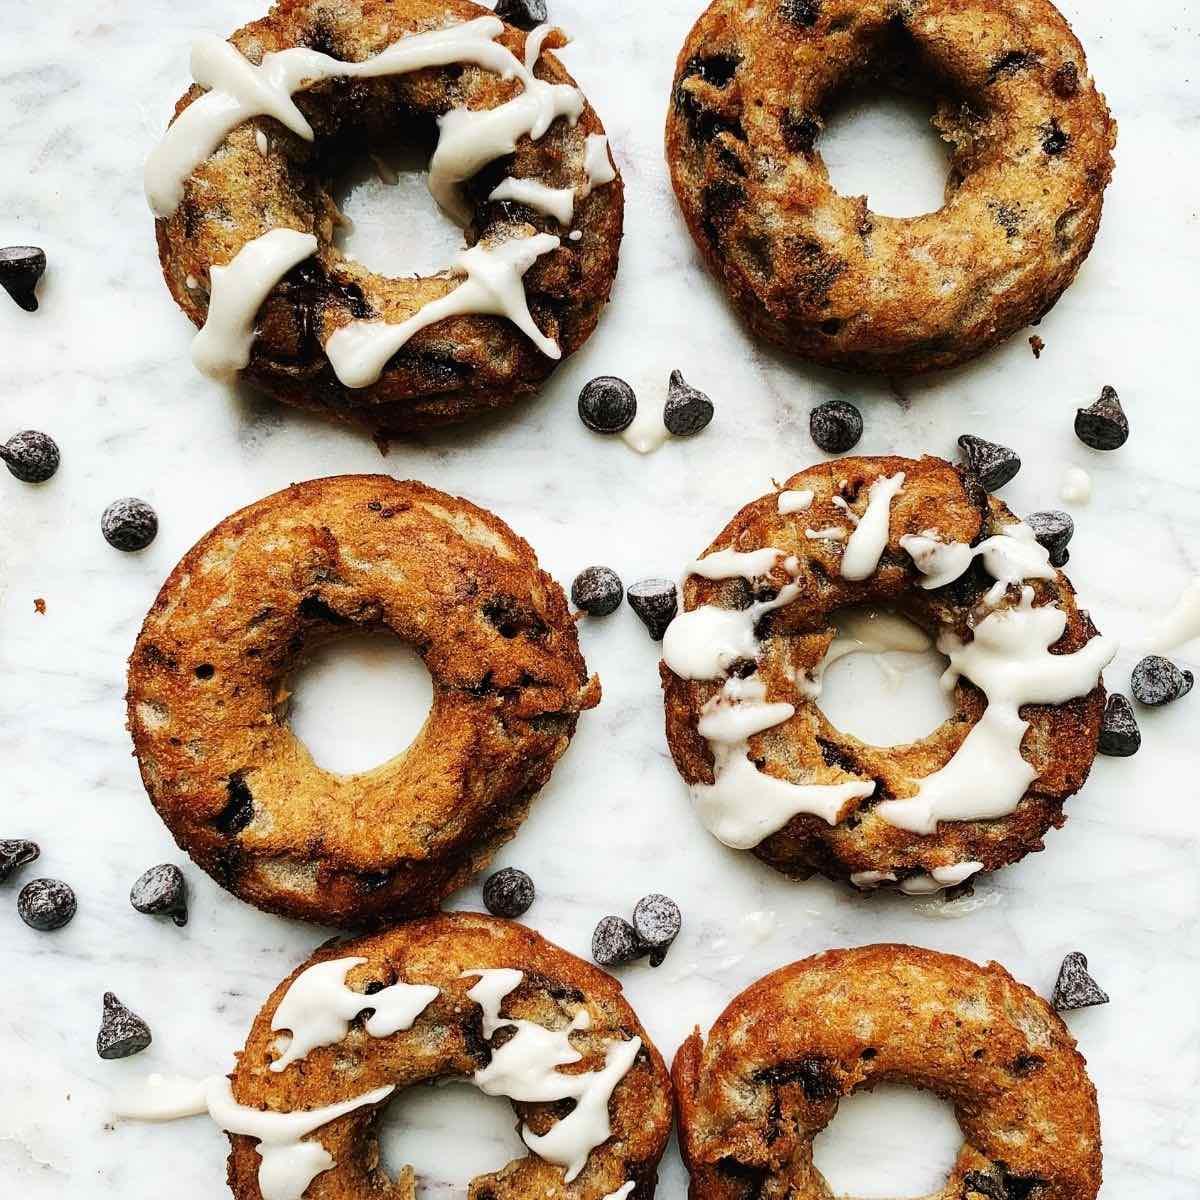 Healthy Banana Doughnuts with Chocolate Chips